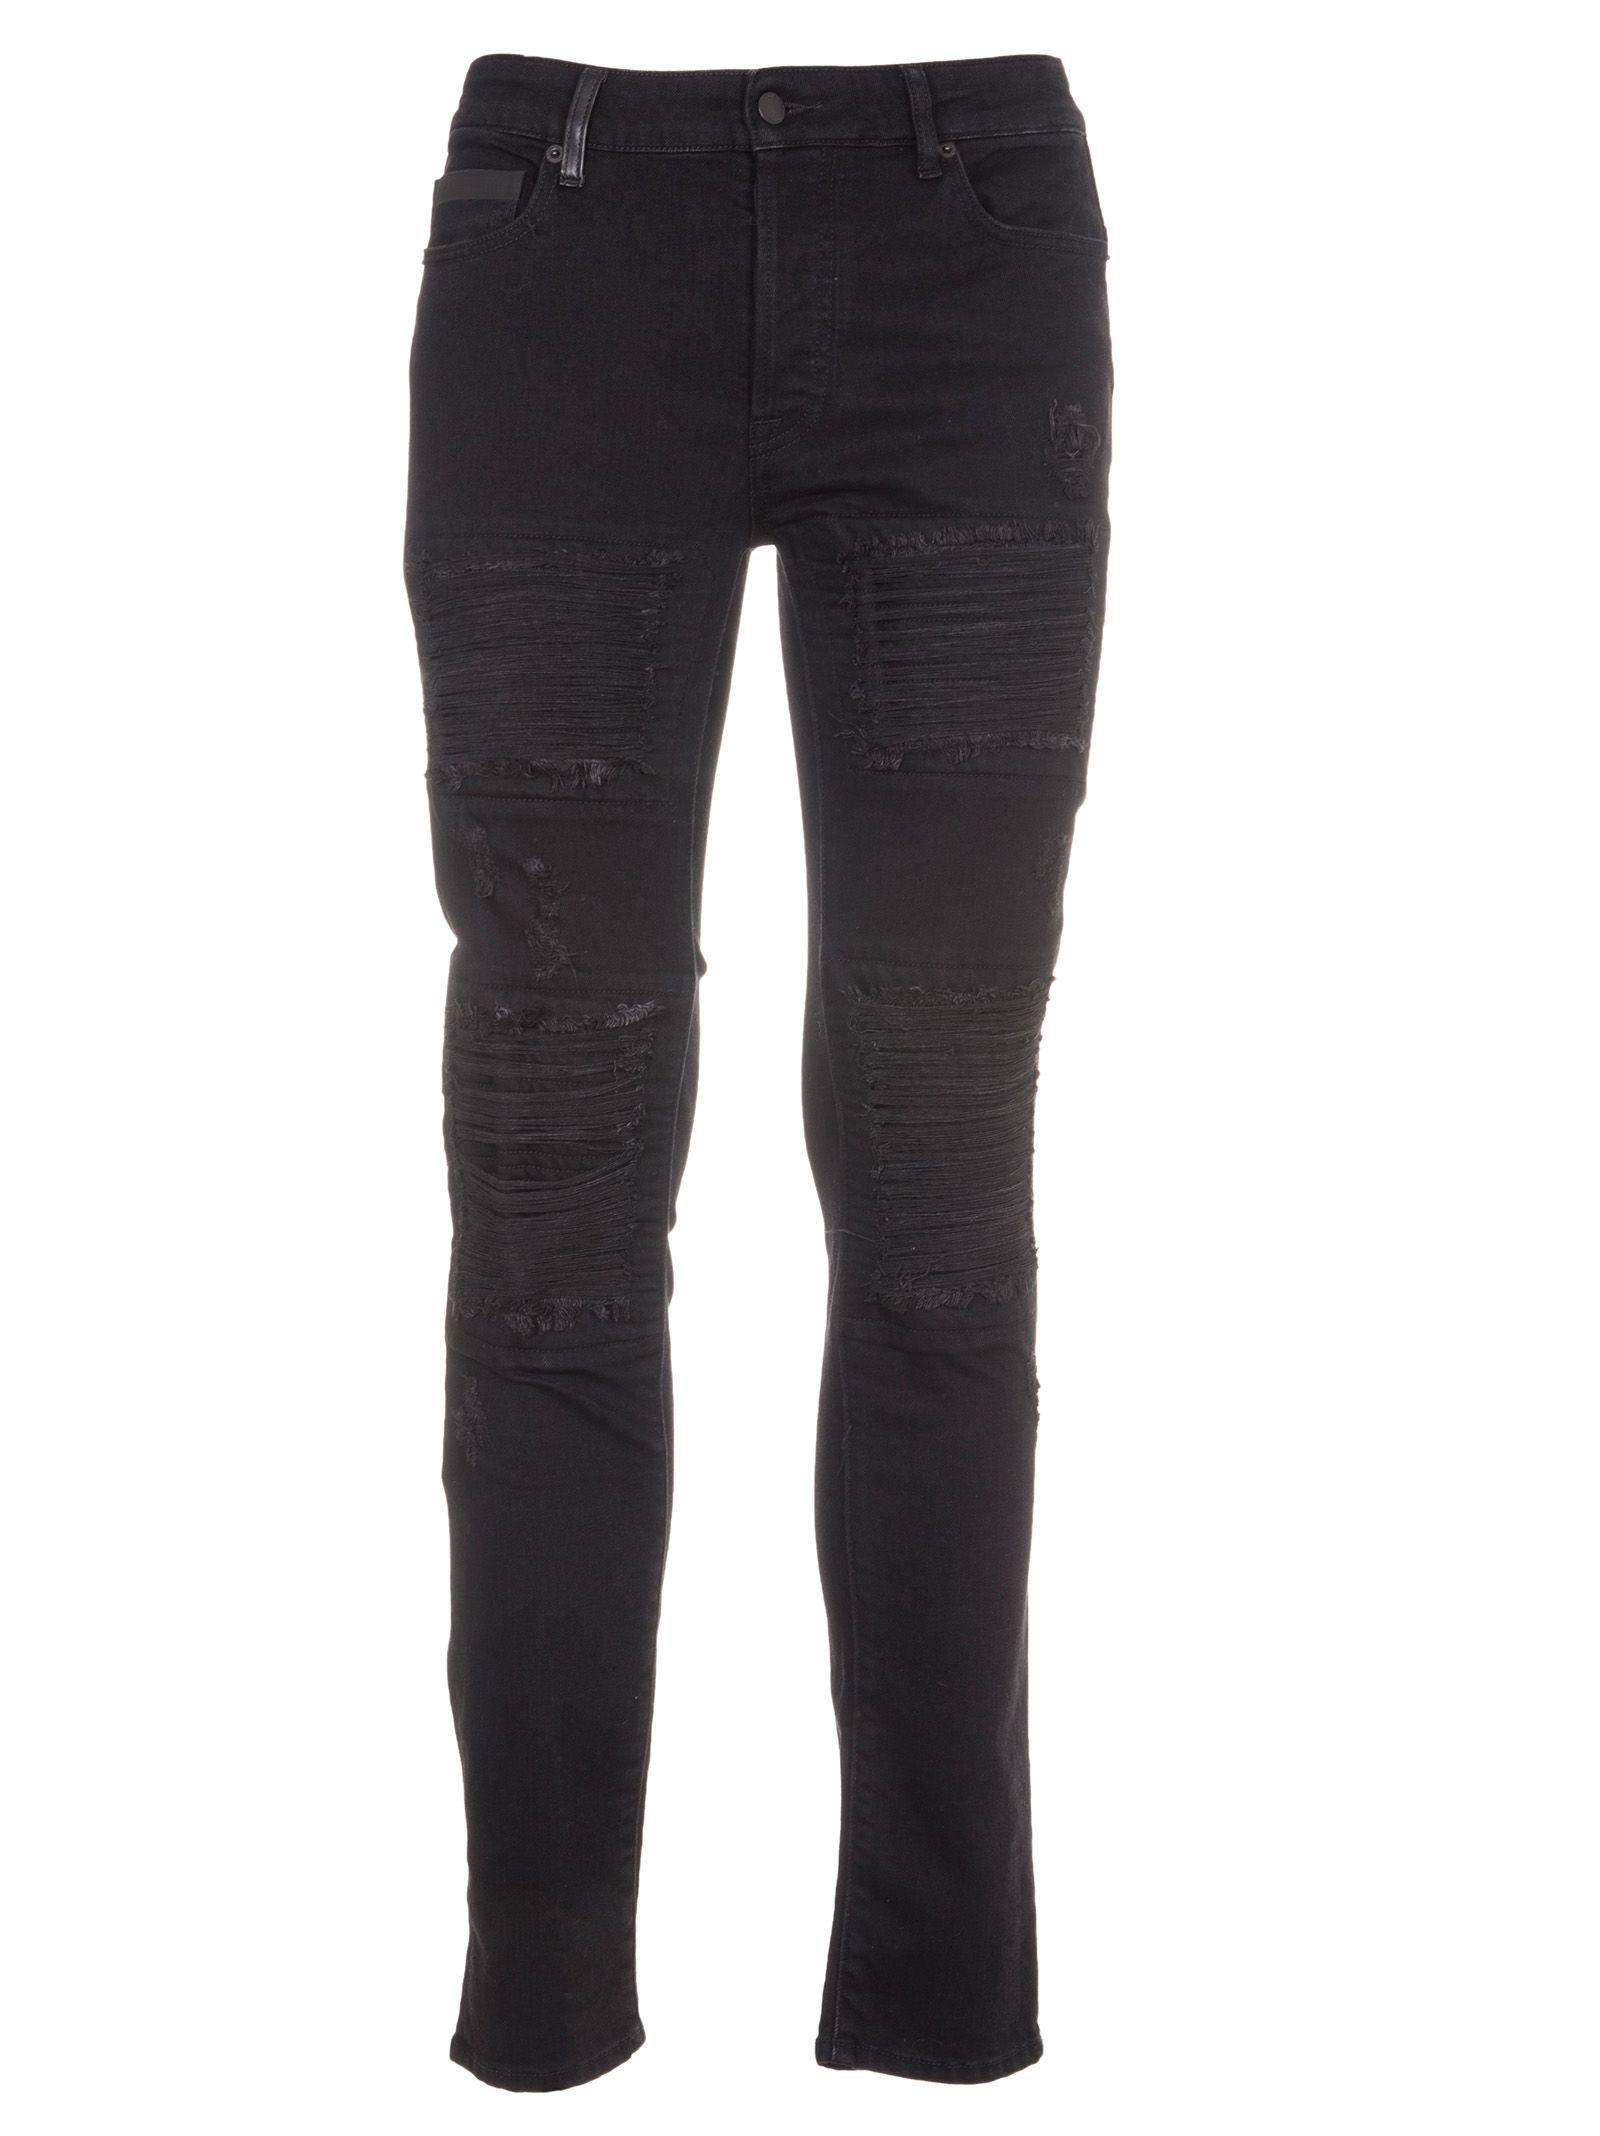 Marcelo Burlon Black Distressed Slim Jeans